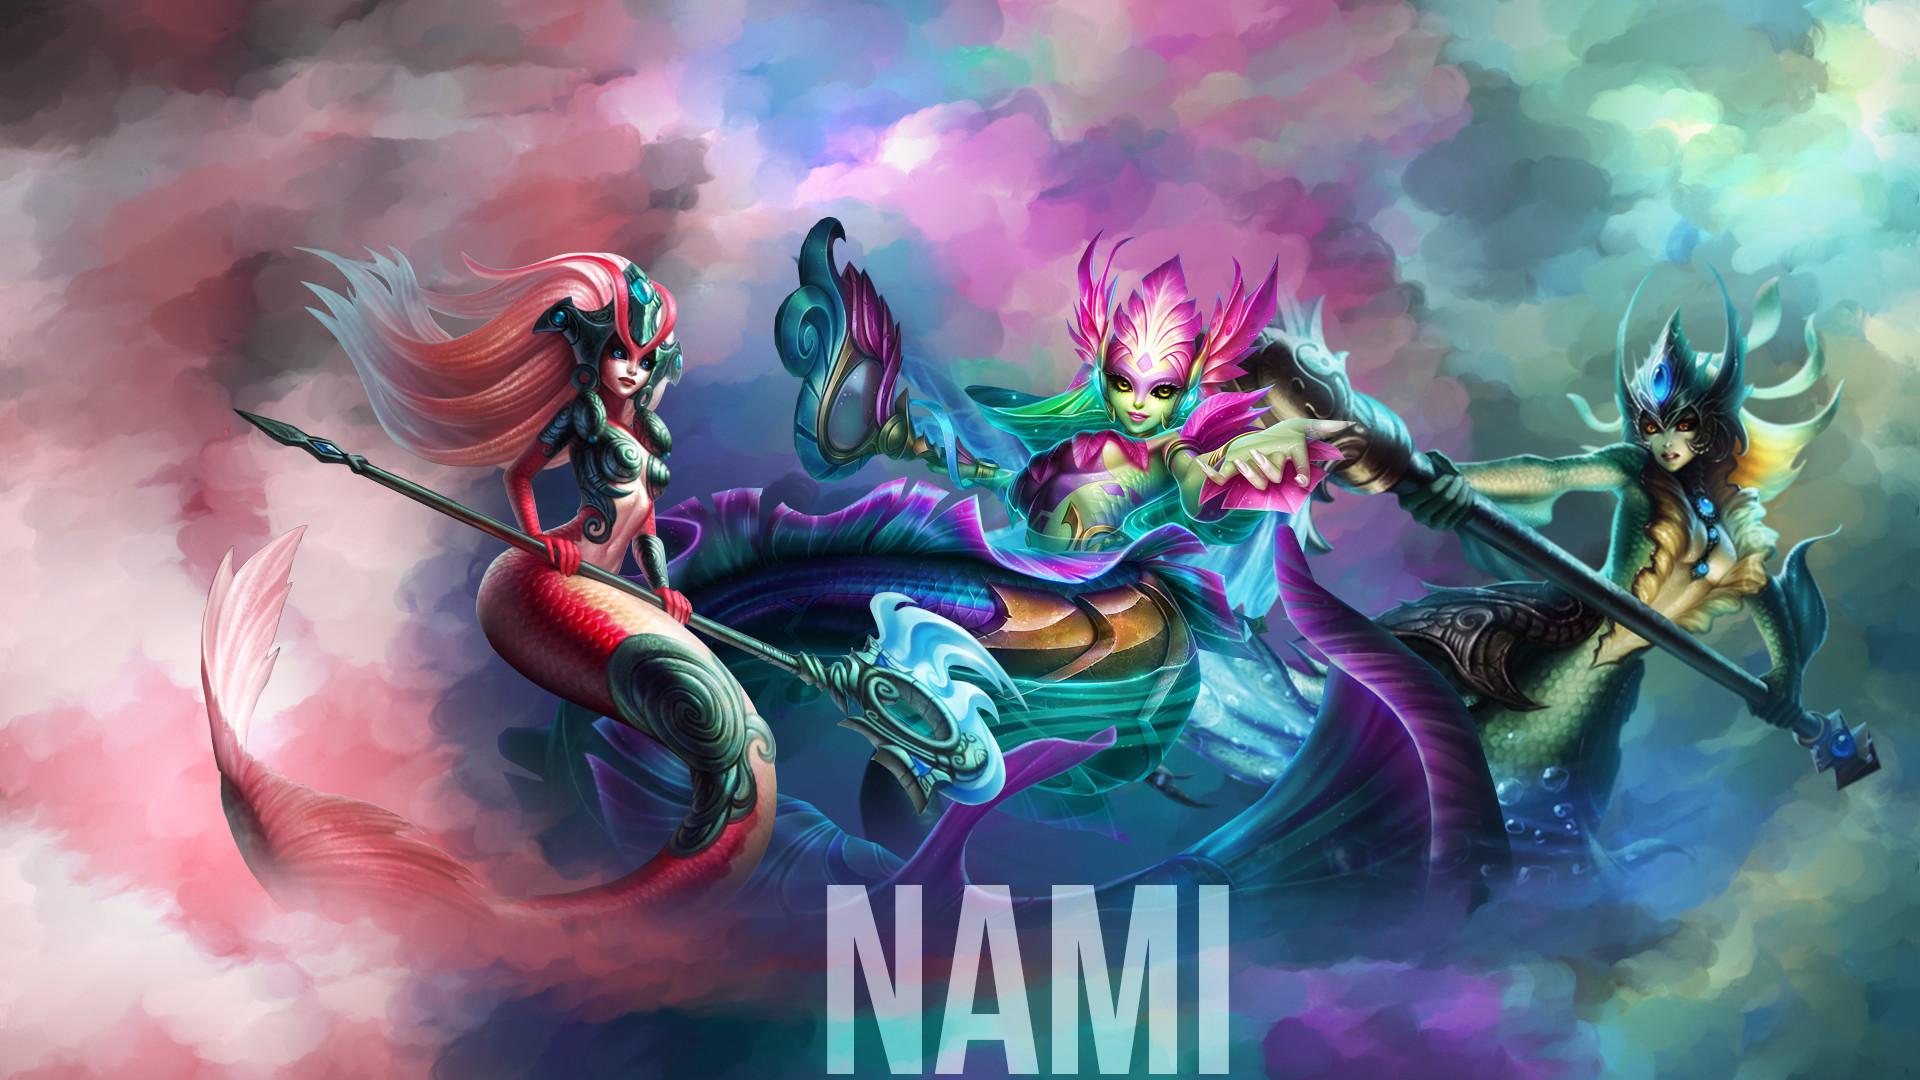 Res: 1920x1080, Nami Skins wallpaper